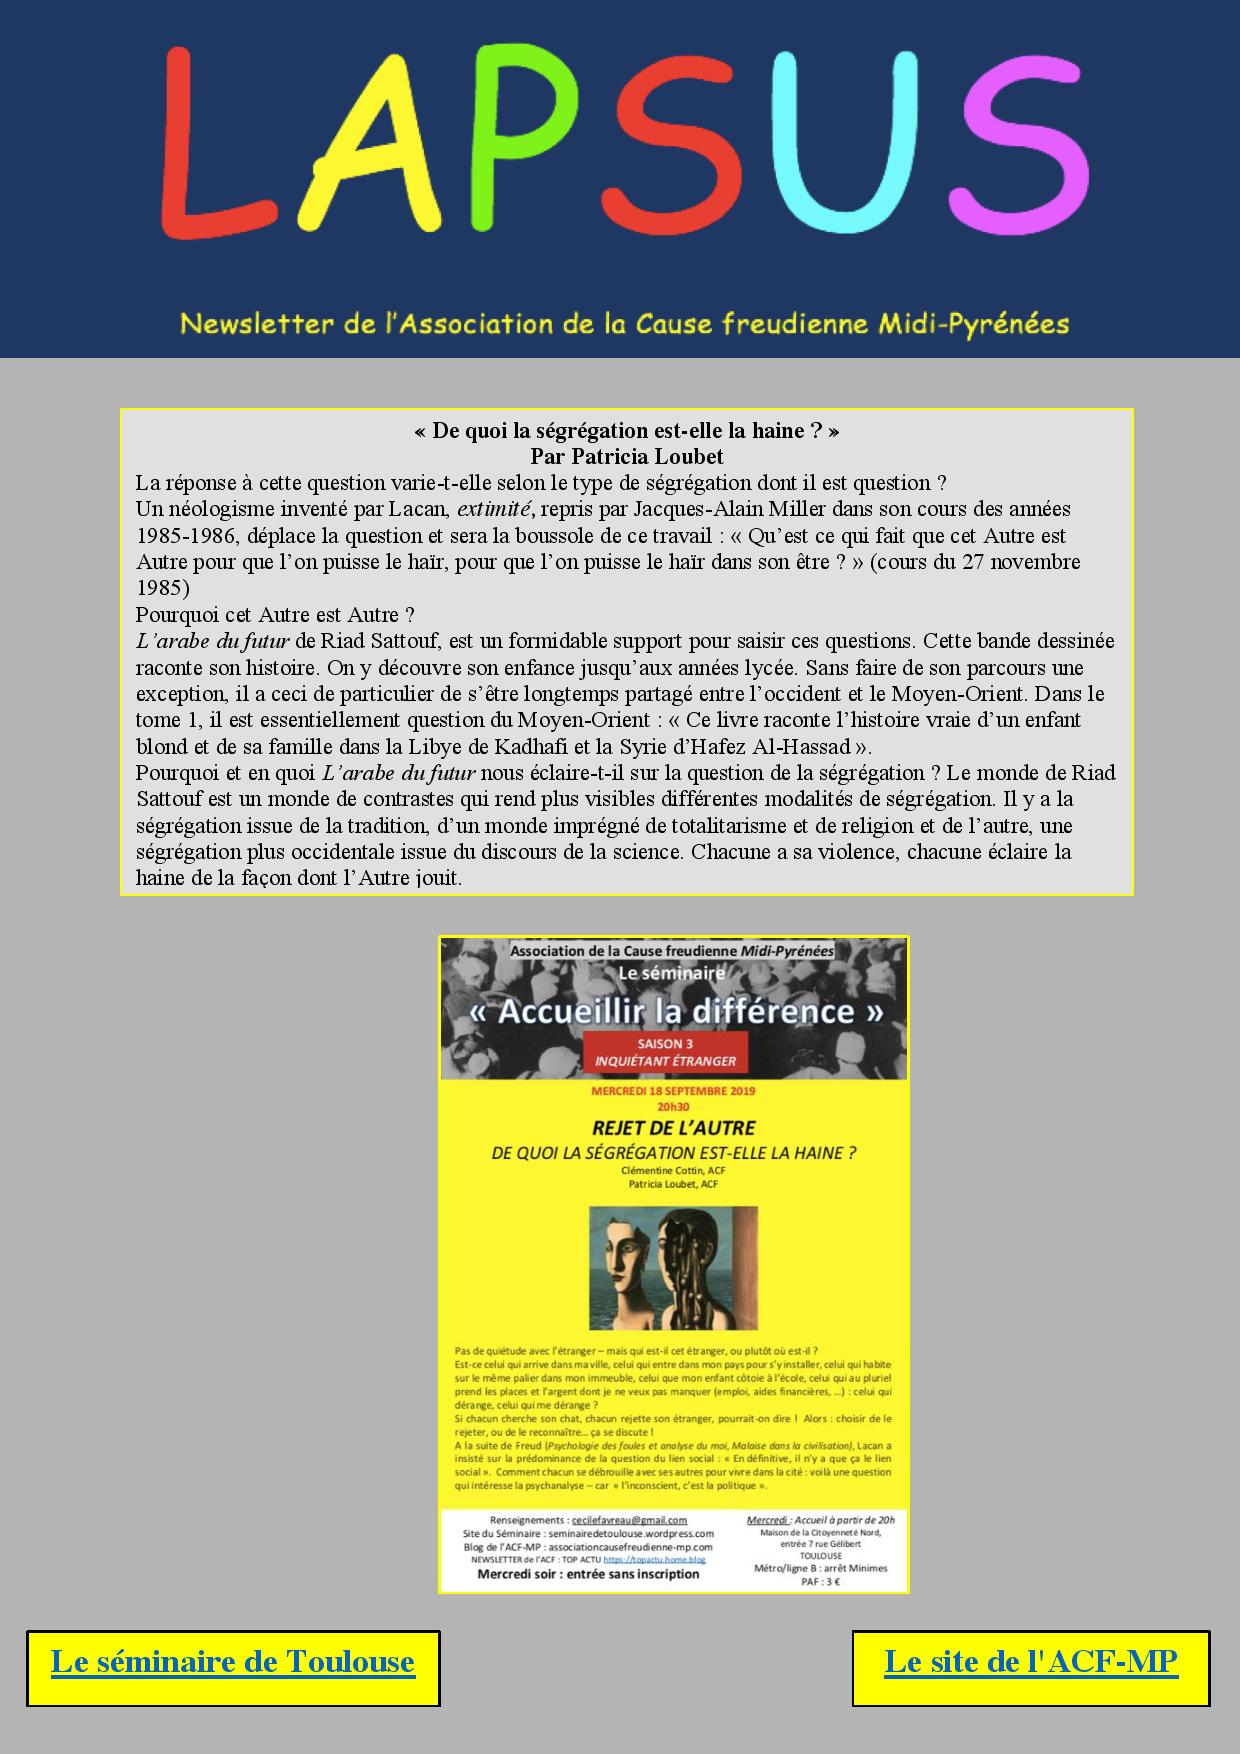 Seminaire Toulouse